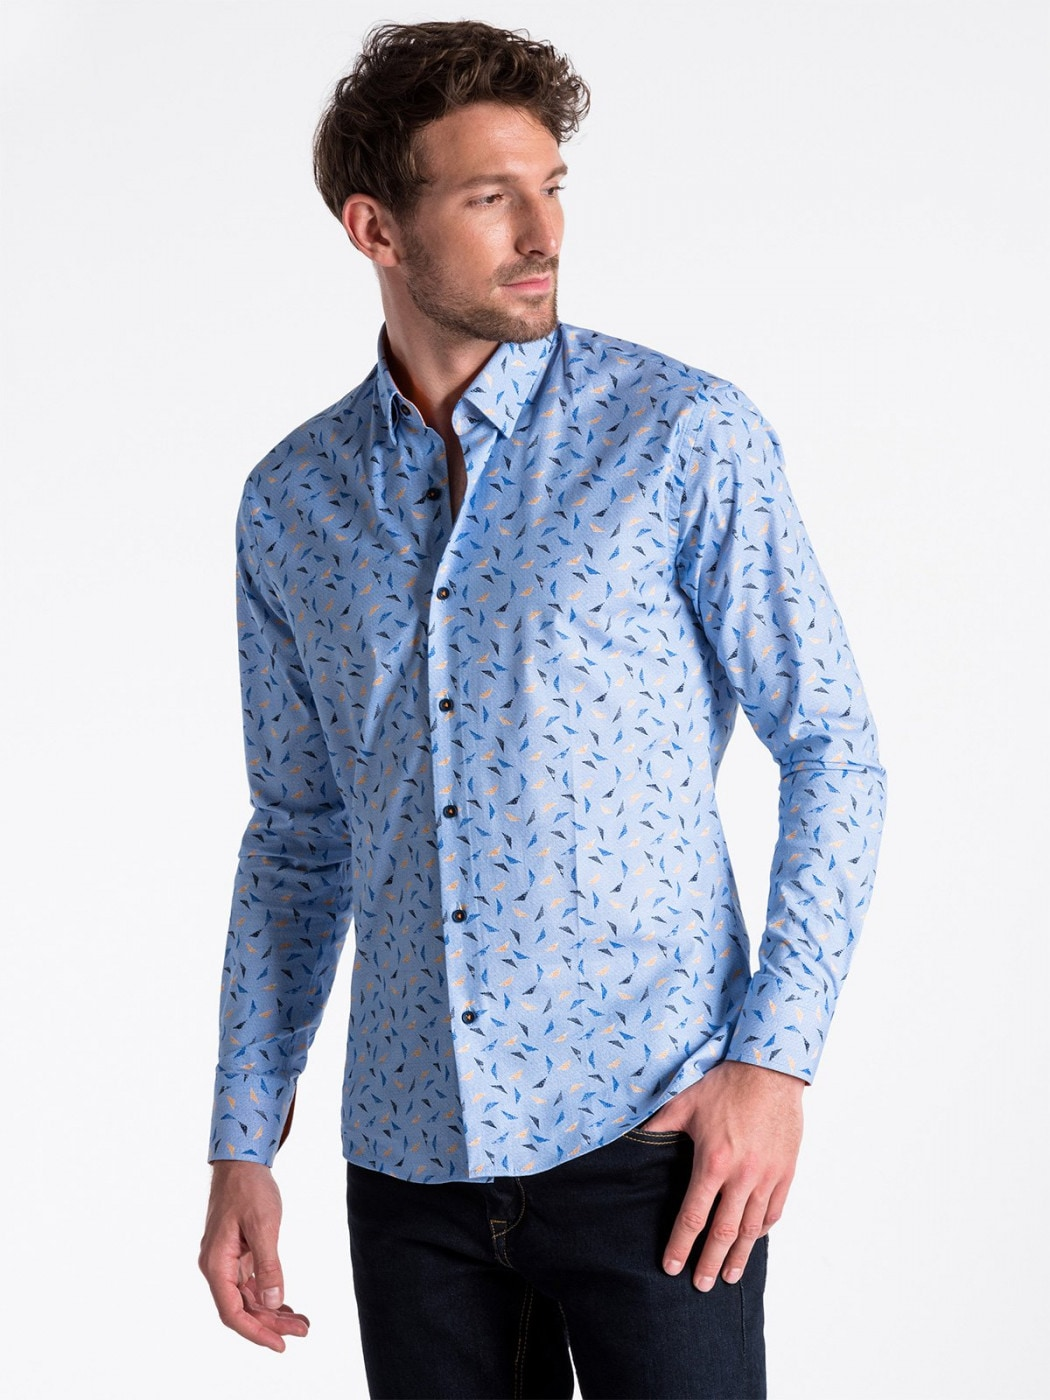 Men's Shirt Ombre K492